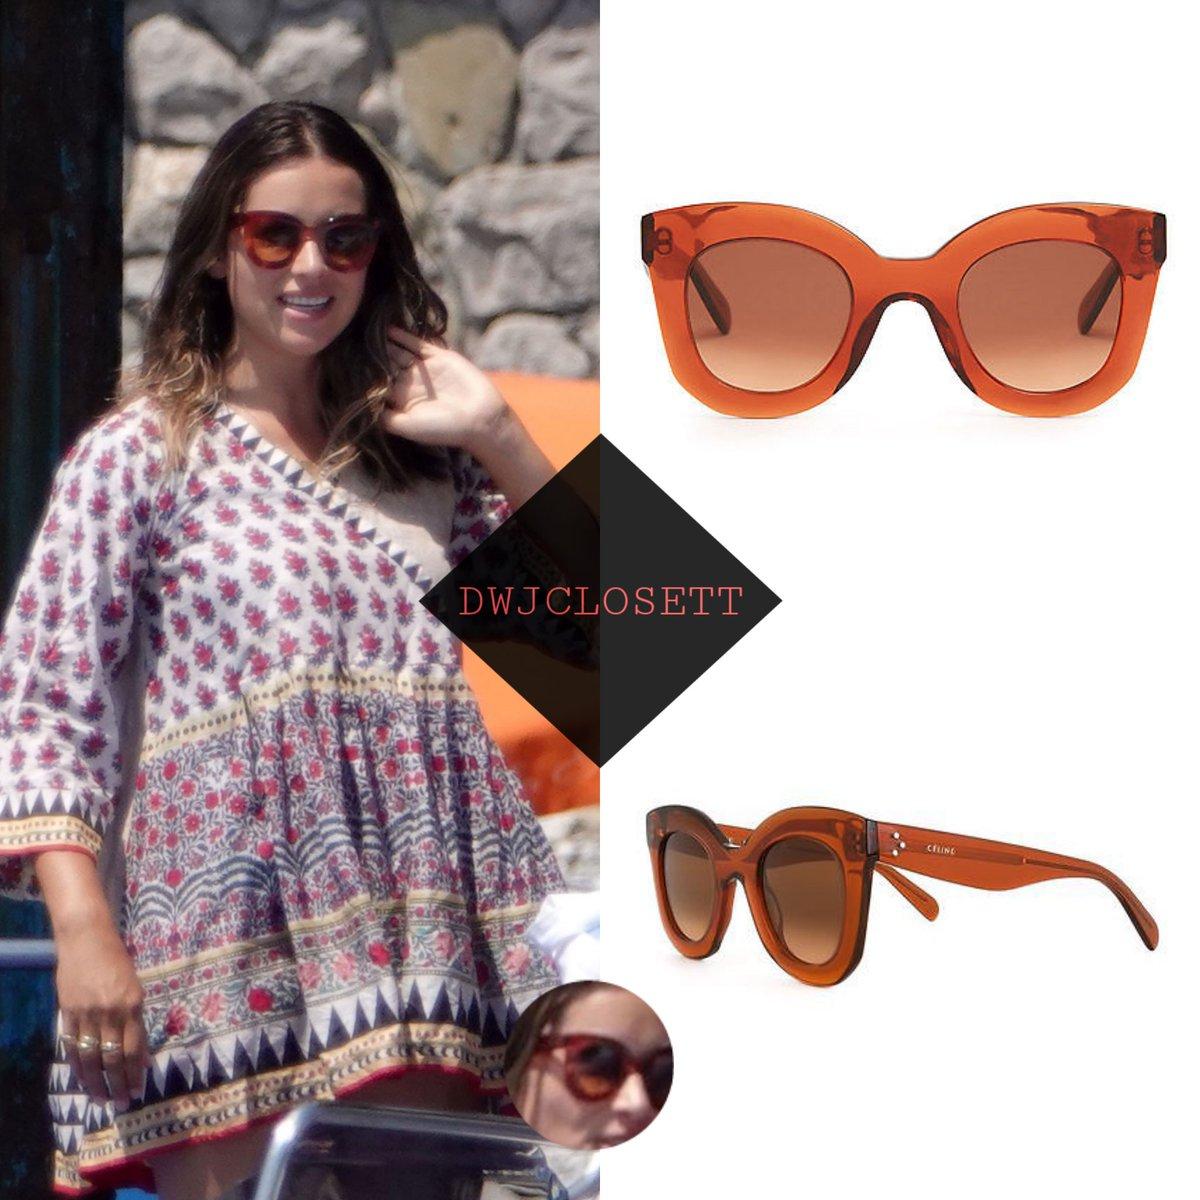 2044bea9134c7 ... sunglasses ruffle Source · Dornan Warner Johnson Closet on Twitter  Amelia in Nerano with